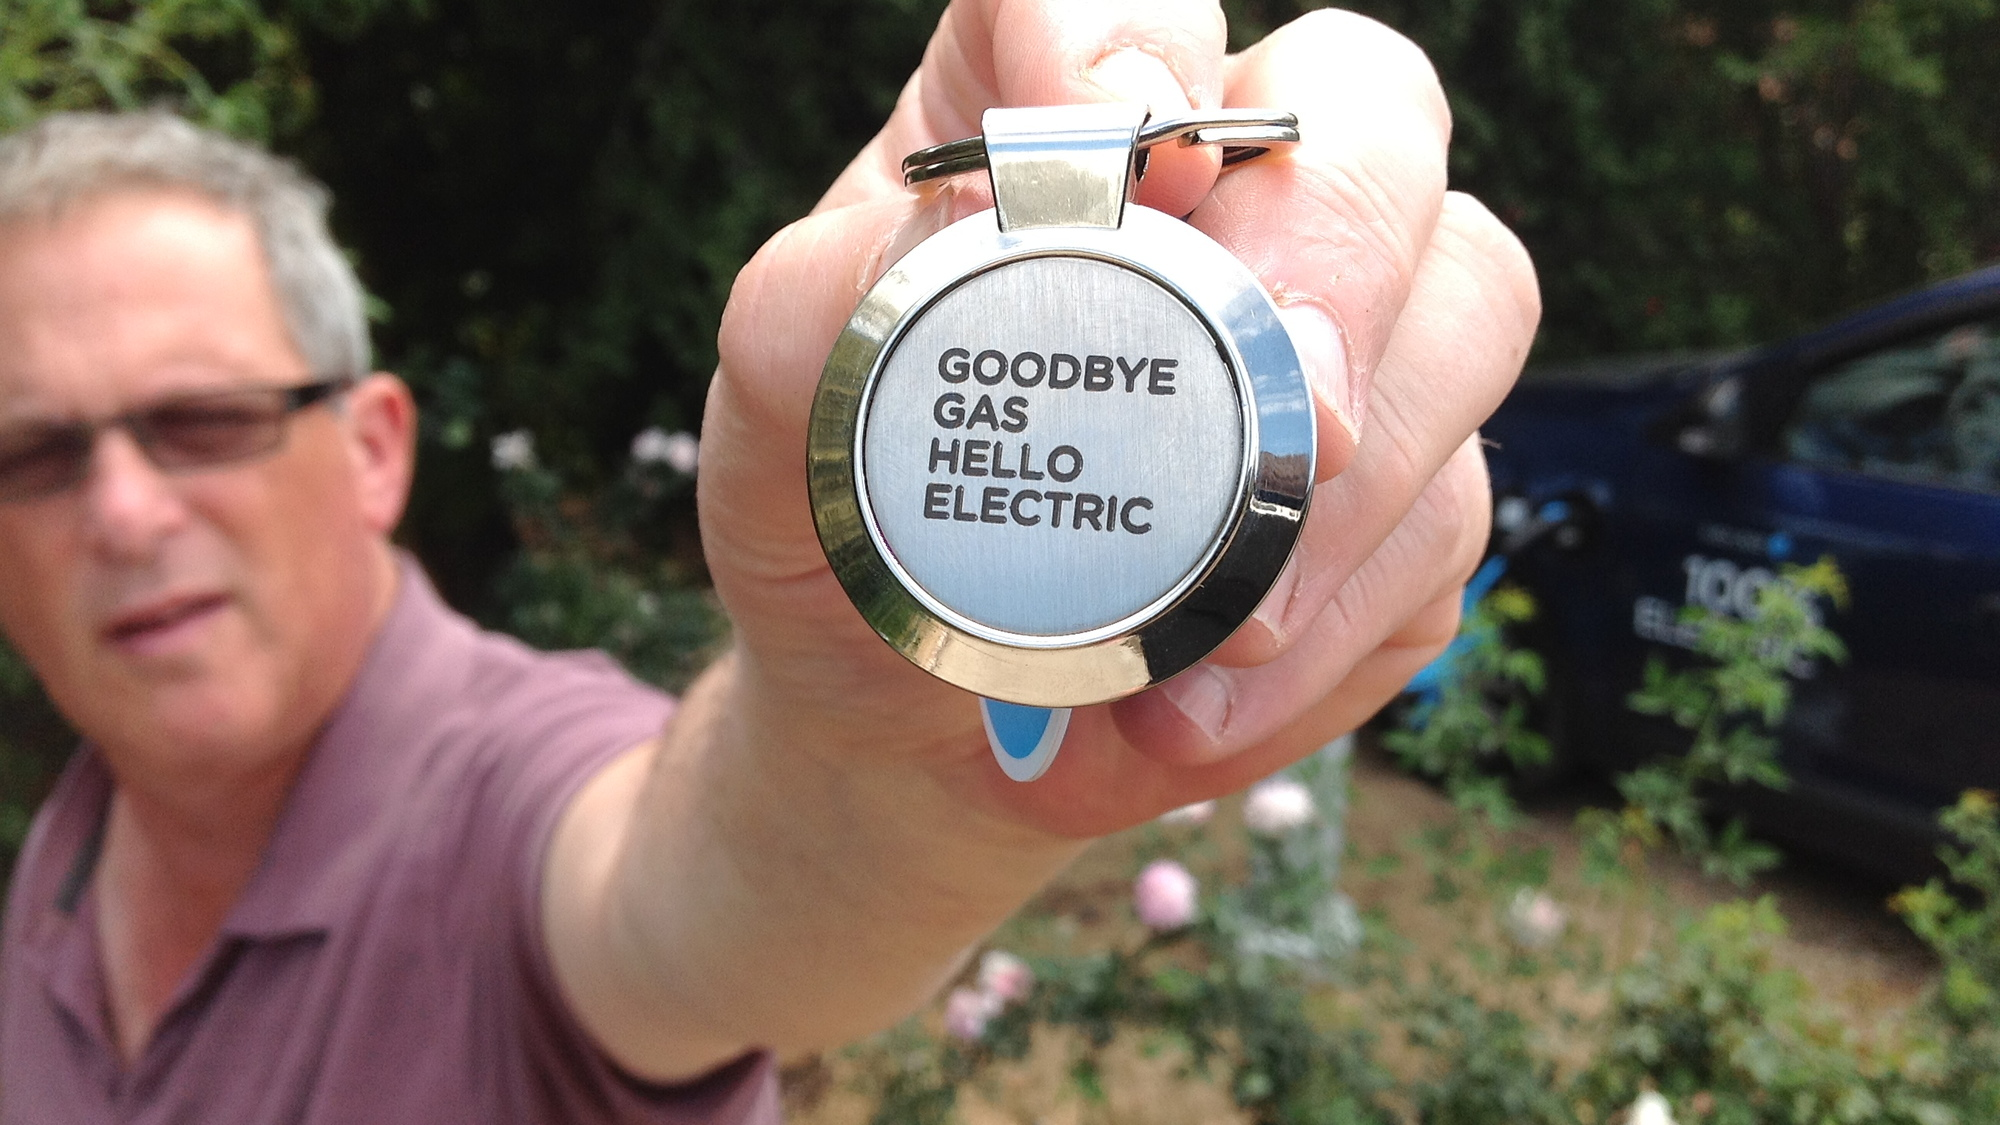 Better Place user David Rose w/keys to Renault Fluence ZE electric car in Israel [photo: David Rose]